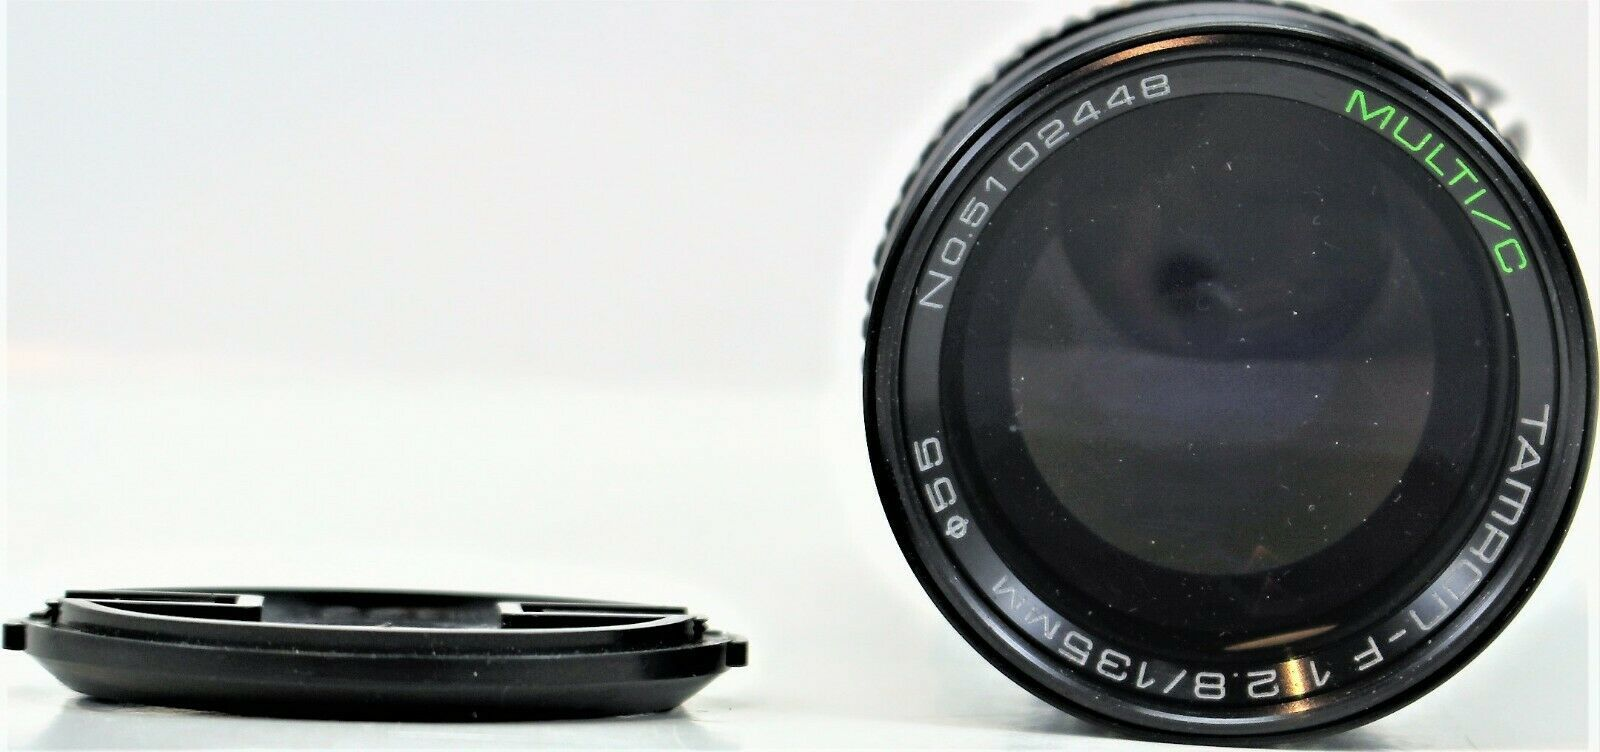 Tamron Multi C F 1:2.8 135mm Camera Lens for Nikon AI With Soft Case image 3